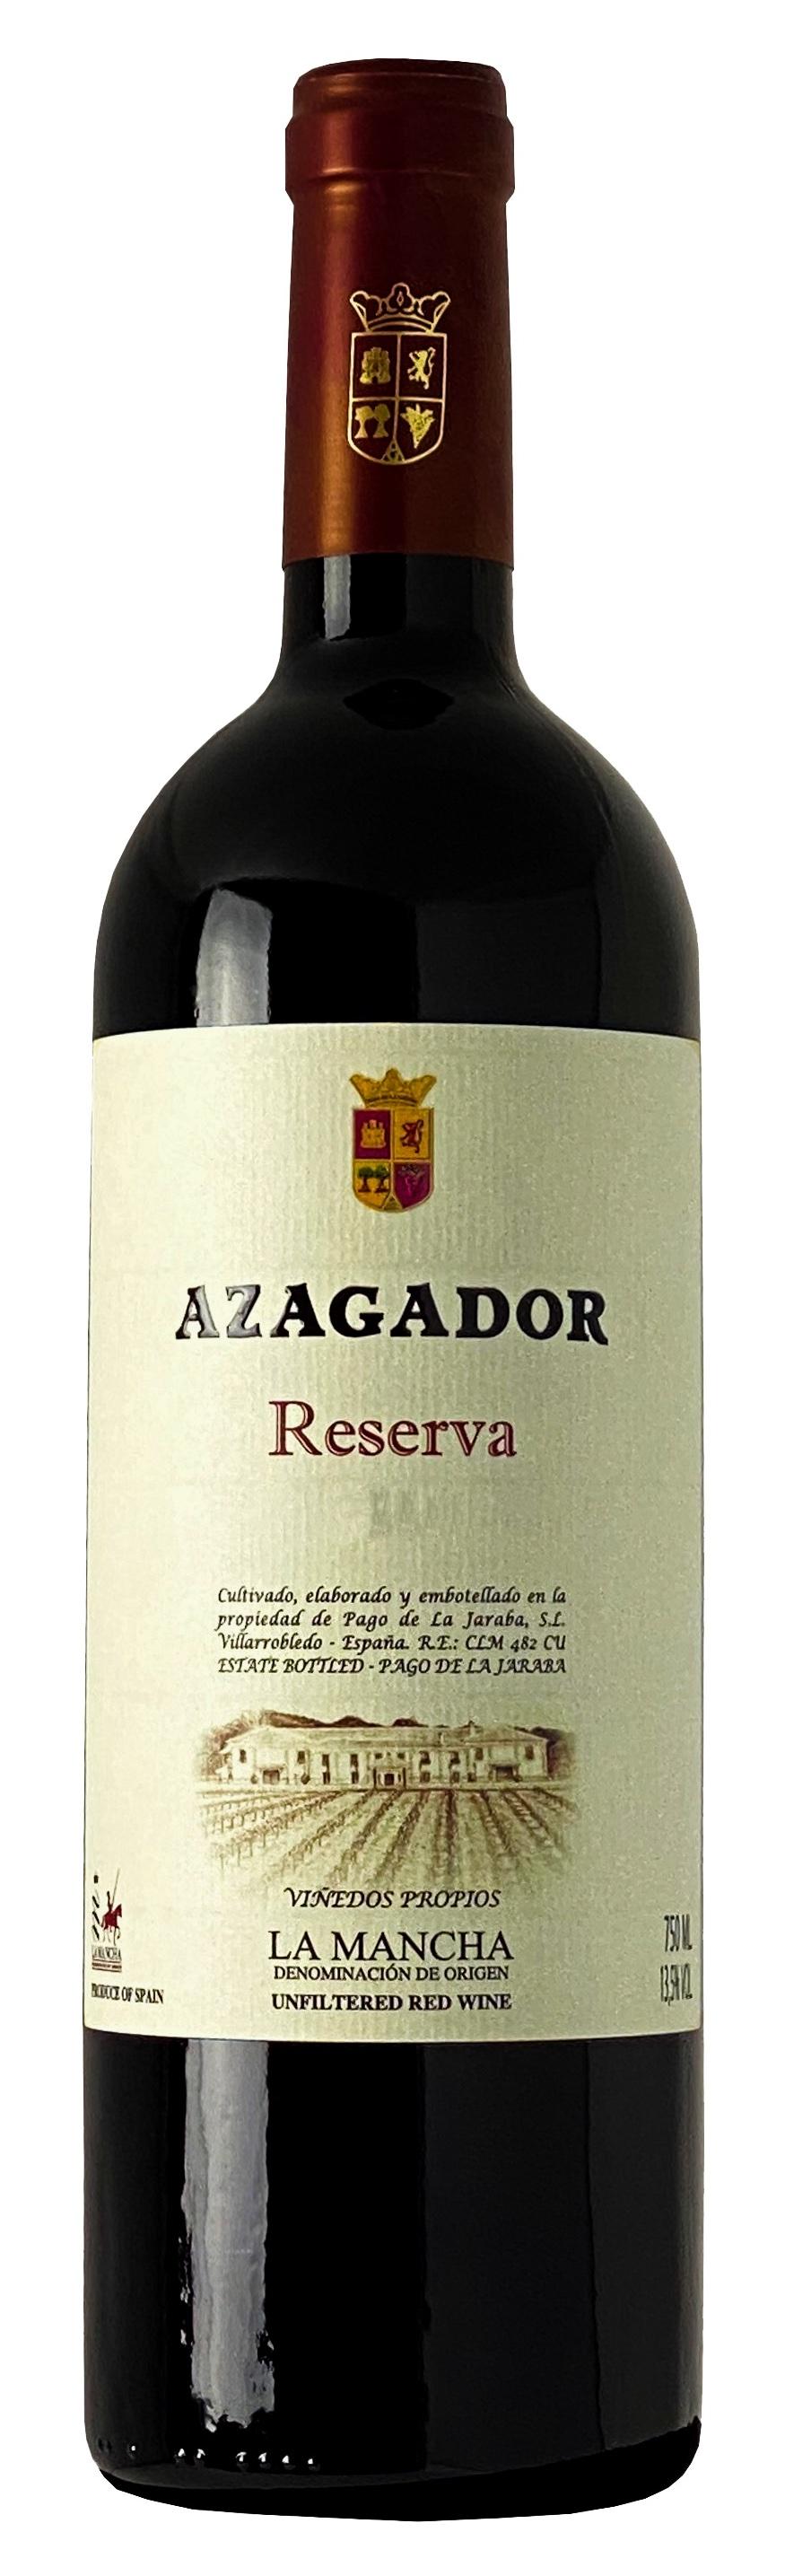 Azagador Reserva | Pago de la Jaraba - Winexfood